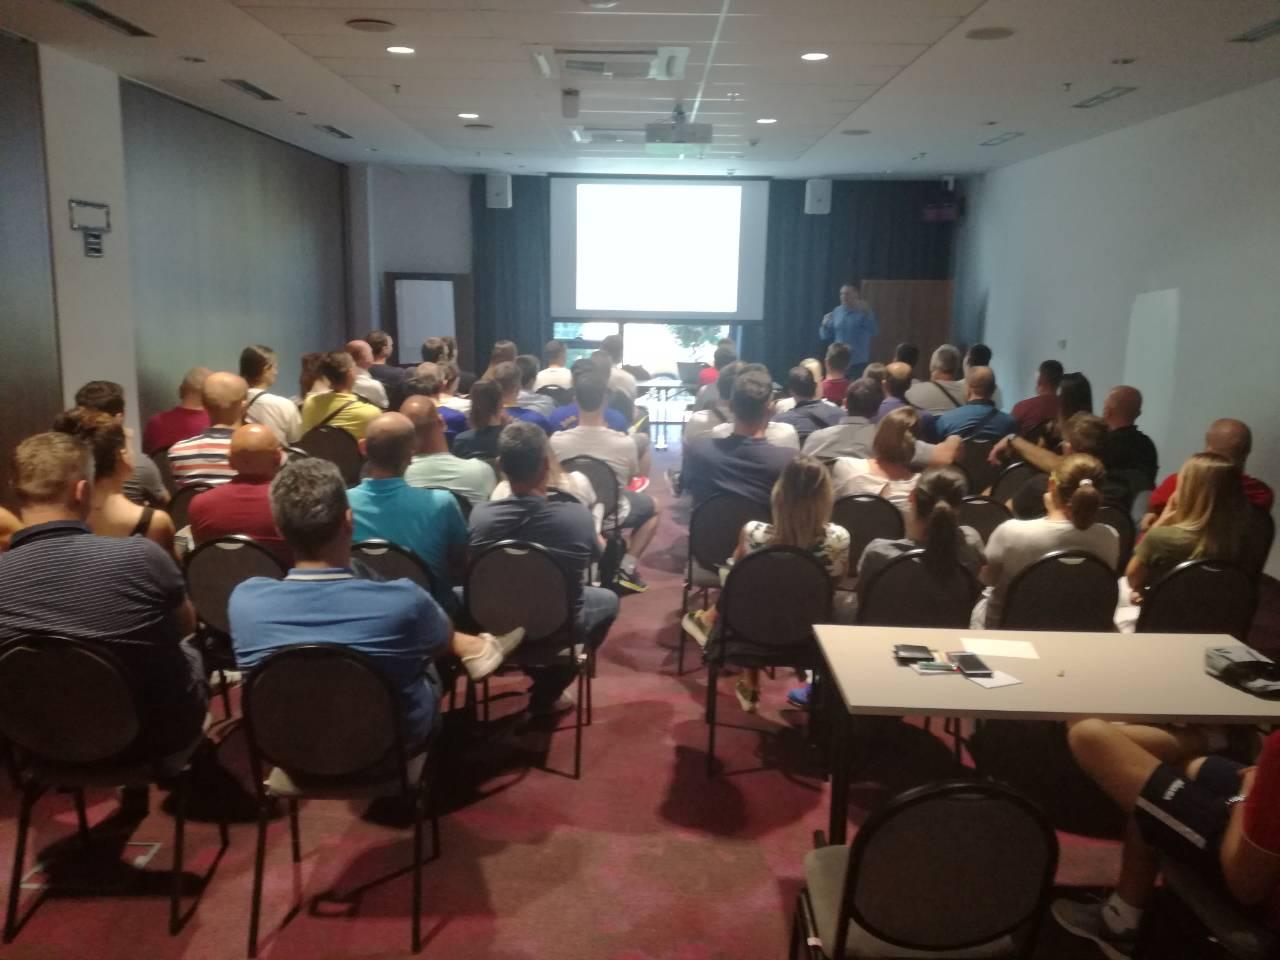 licencni-seminar-trenerska-organizacija-OSCG-Verde-Complex-2018-2